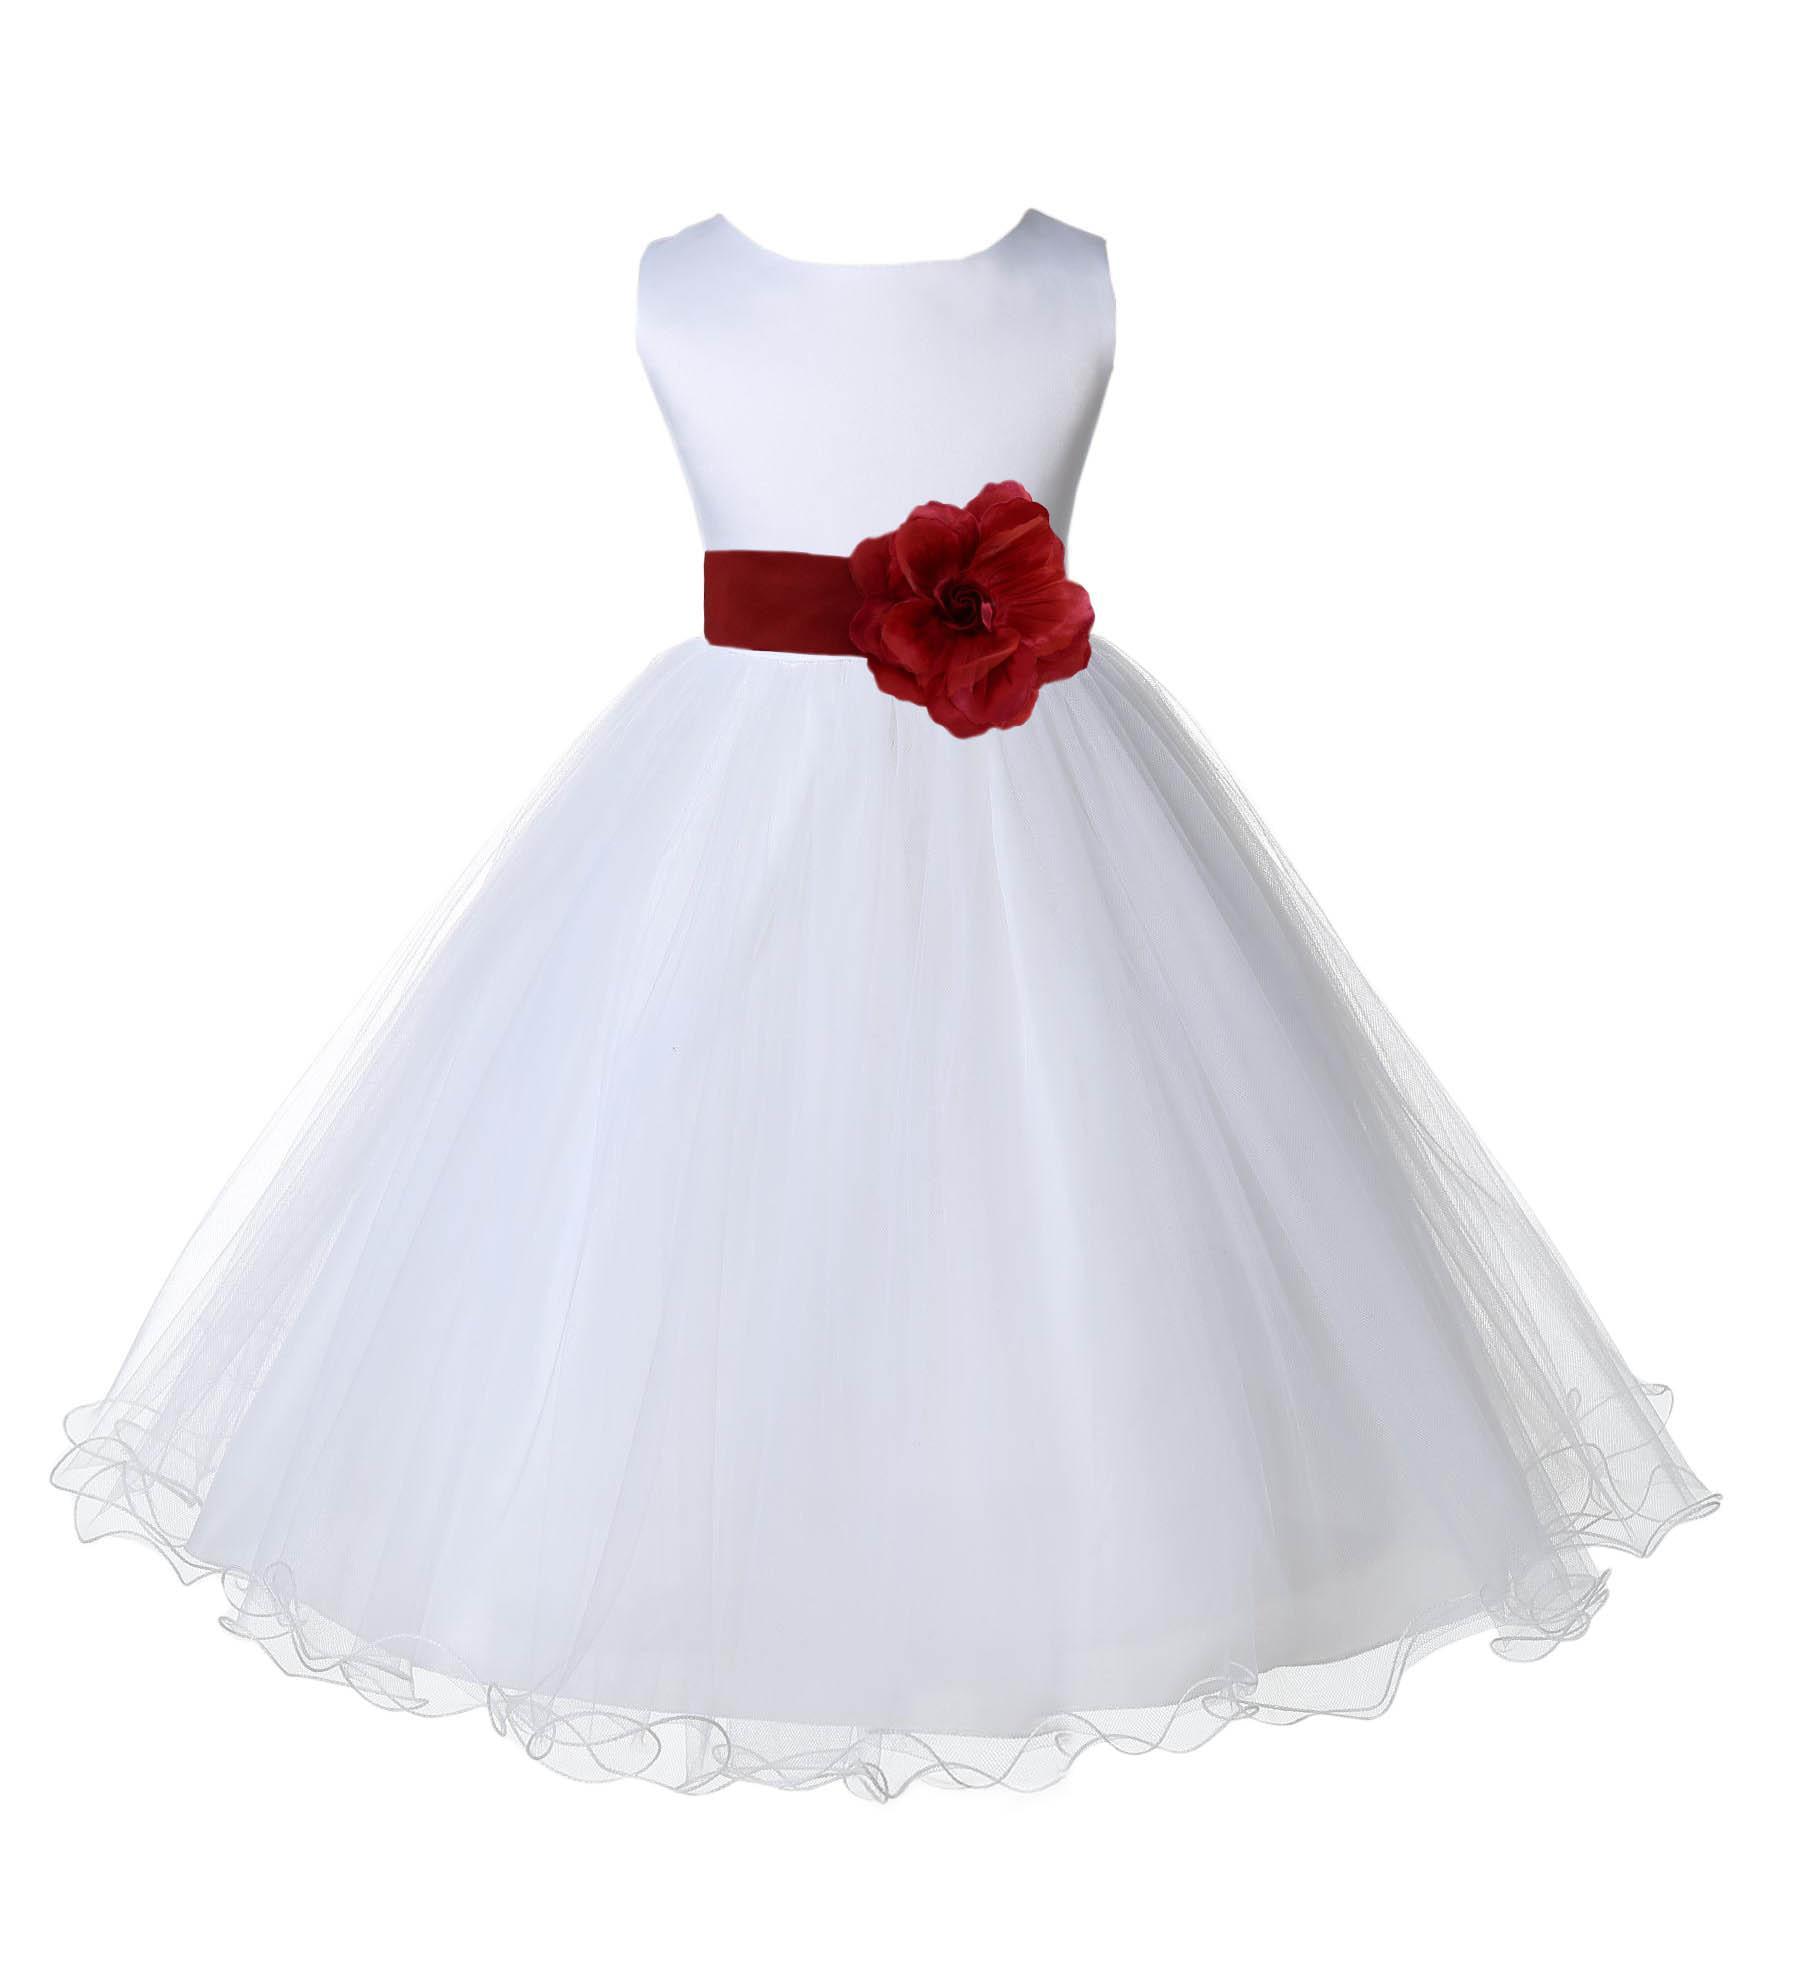 Petals Flower Baby Girl Wedding Easter Junior Bridesmaid Baptism Kid Dress 0-24M